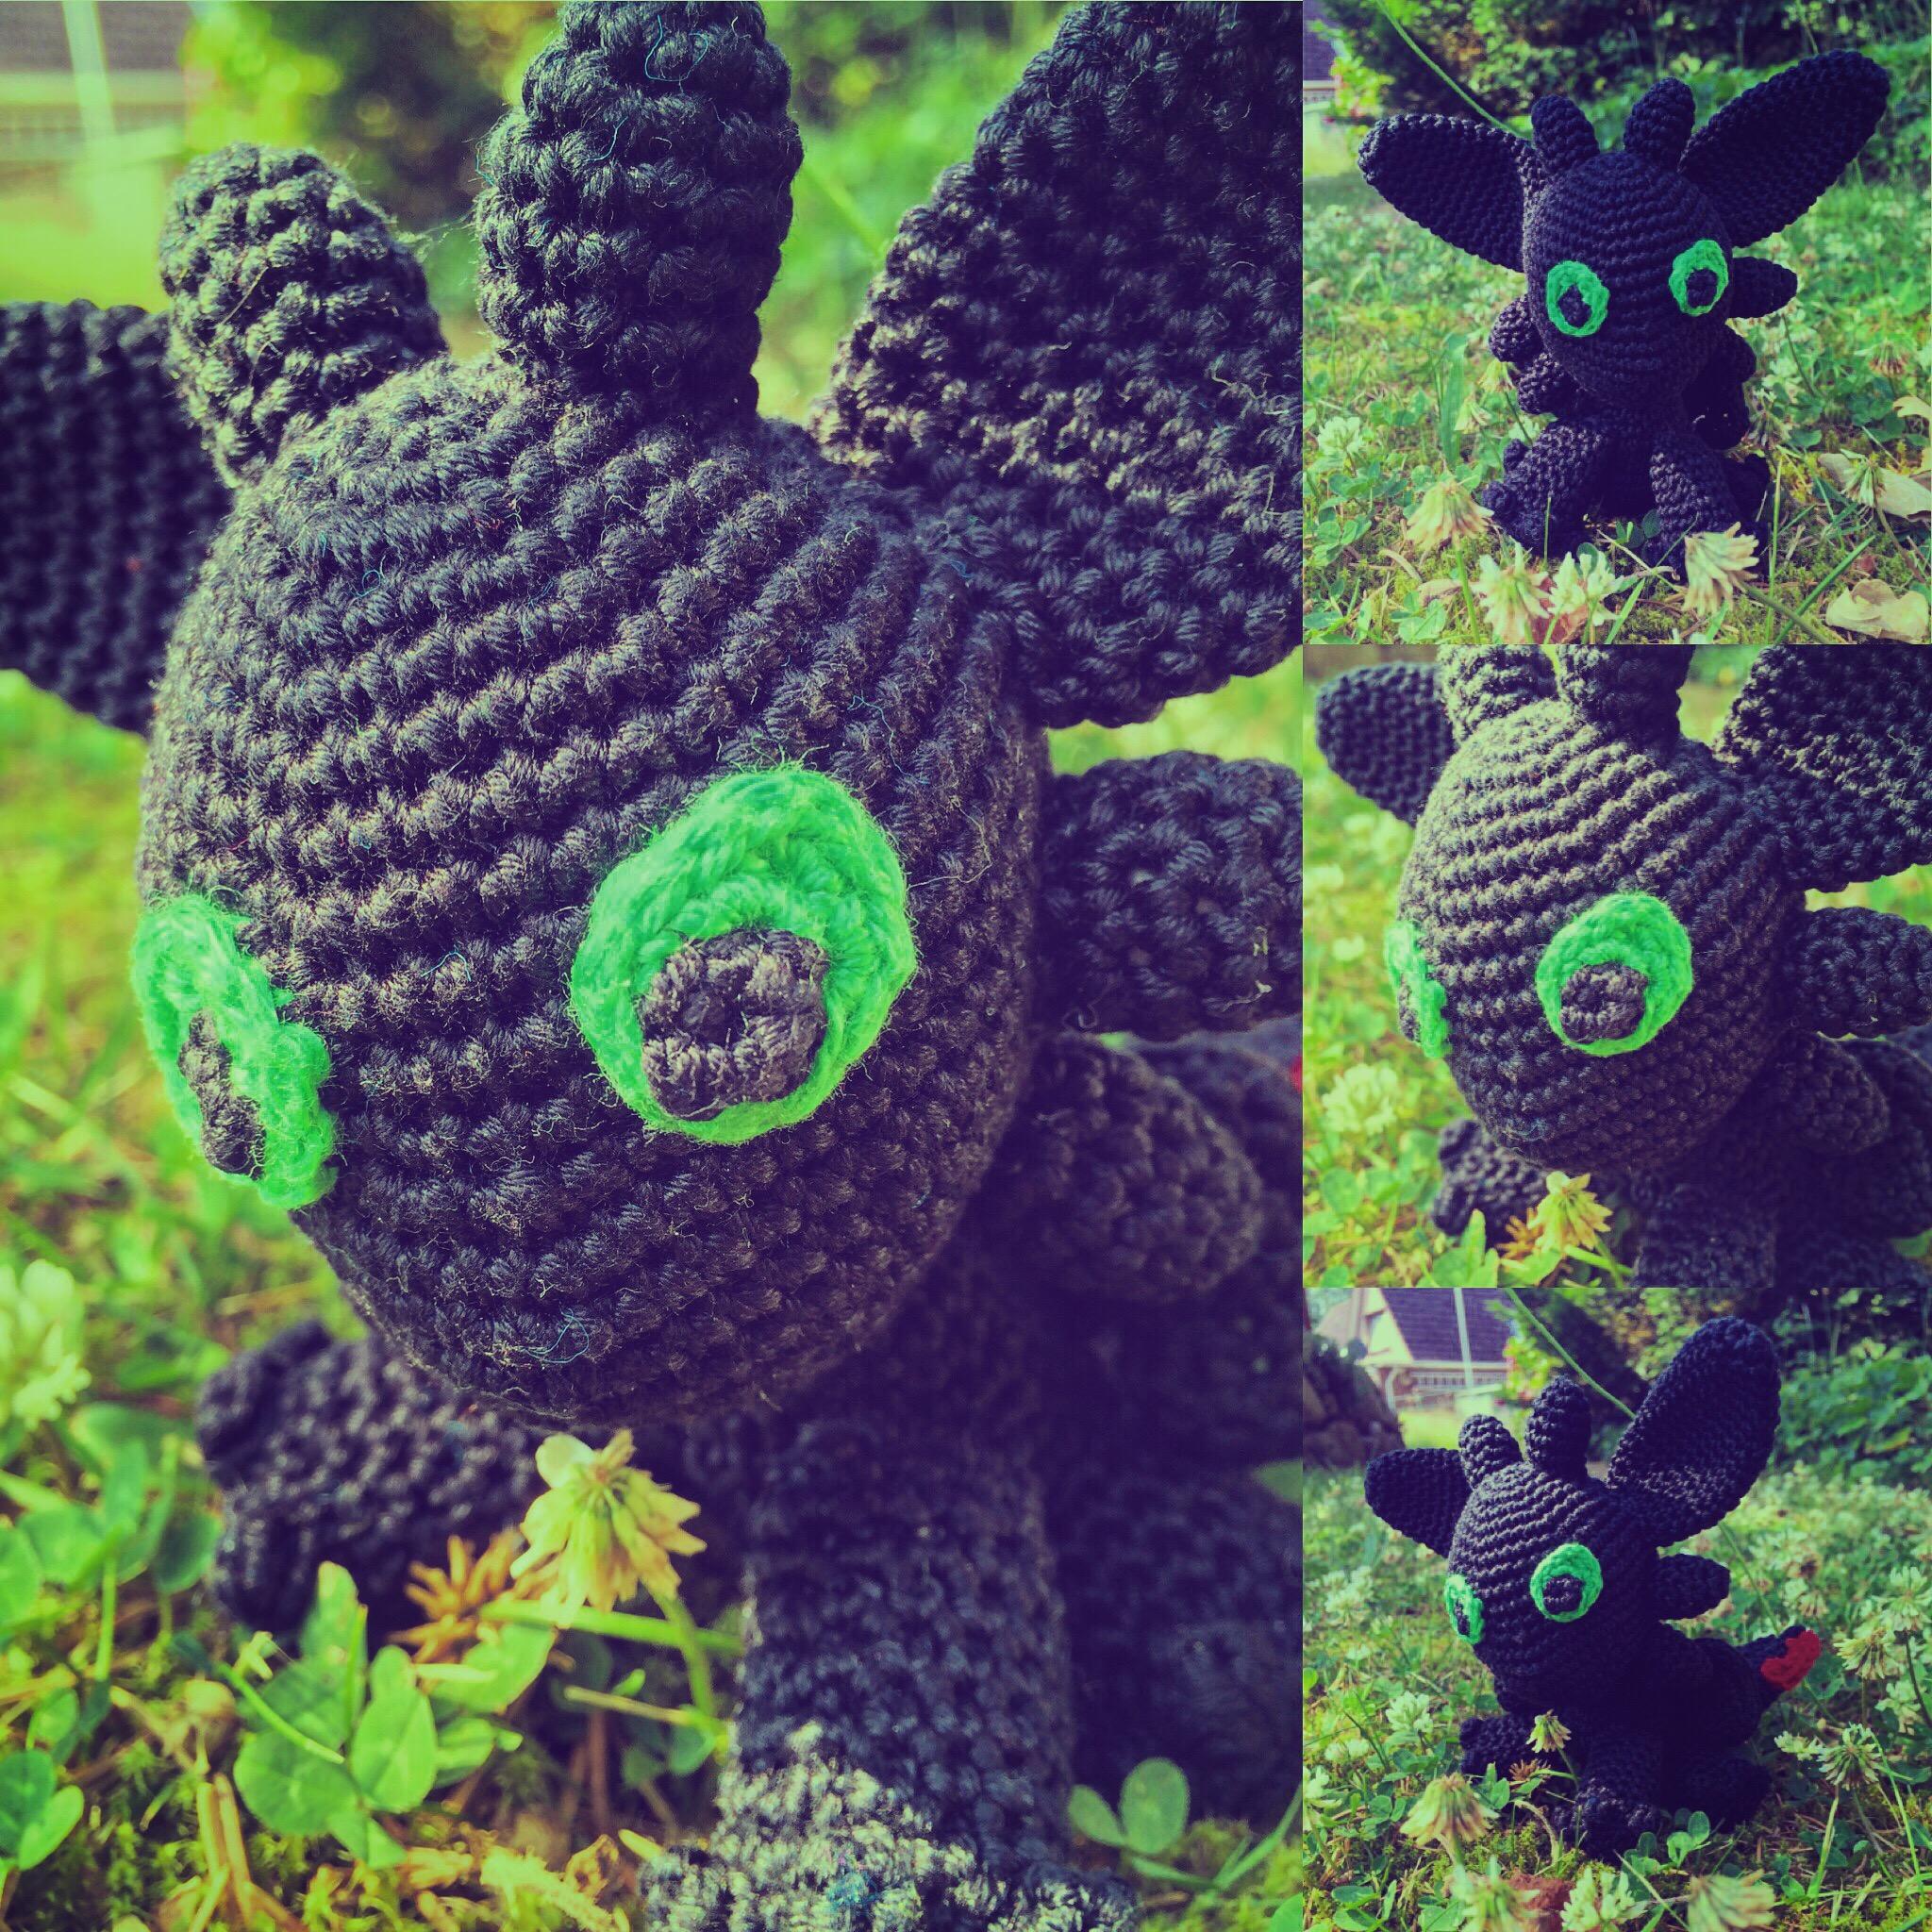 Ravelry: Tiny unicorn amigurumi pattern by Ahooka Migurumi | 2048x2048